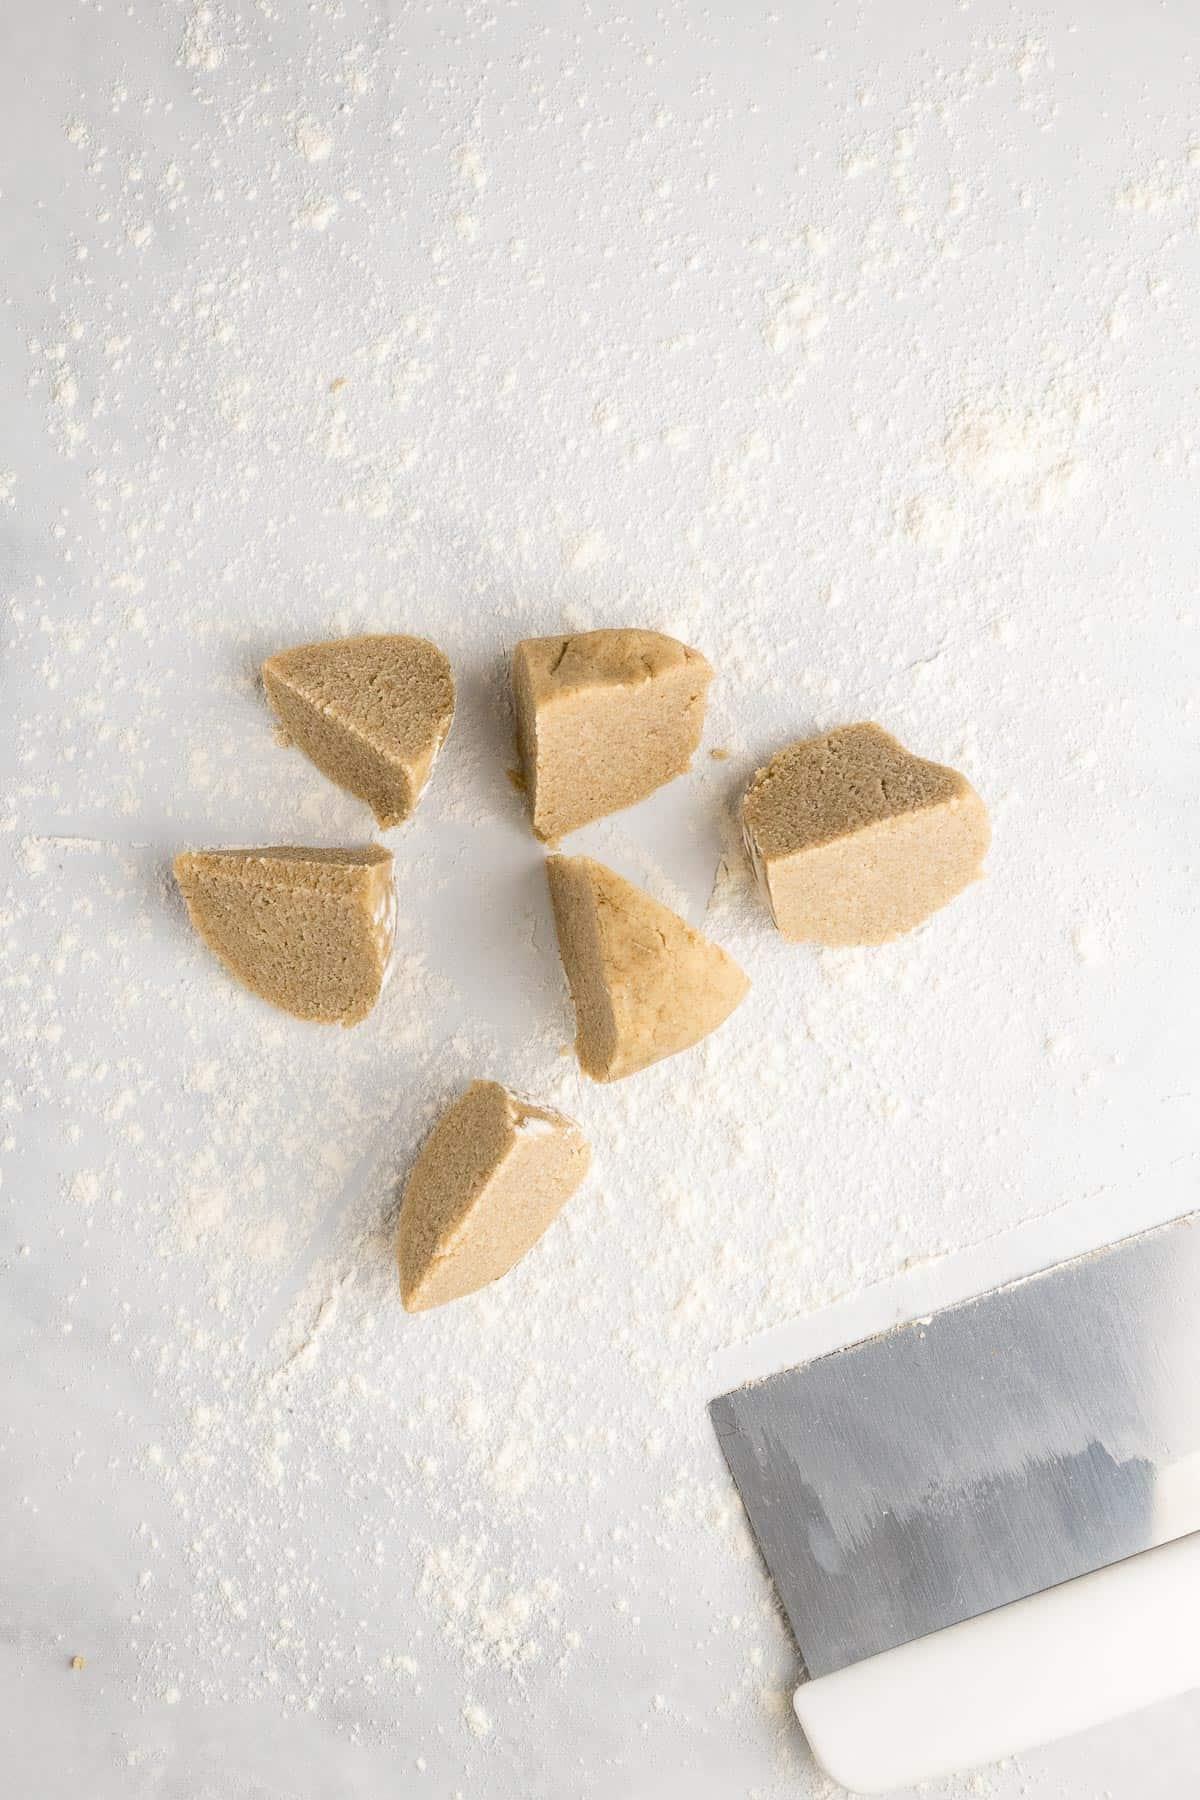 Dough ball cut into six equal pieces